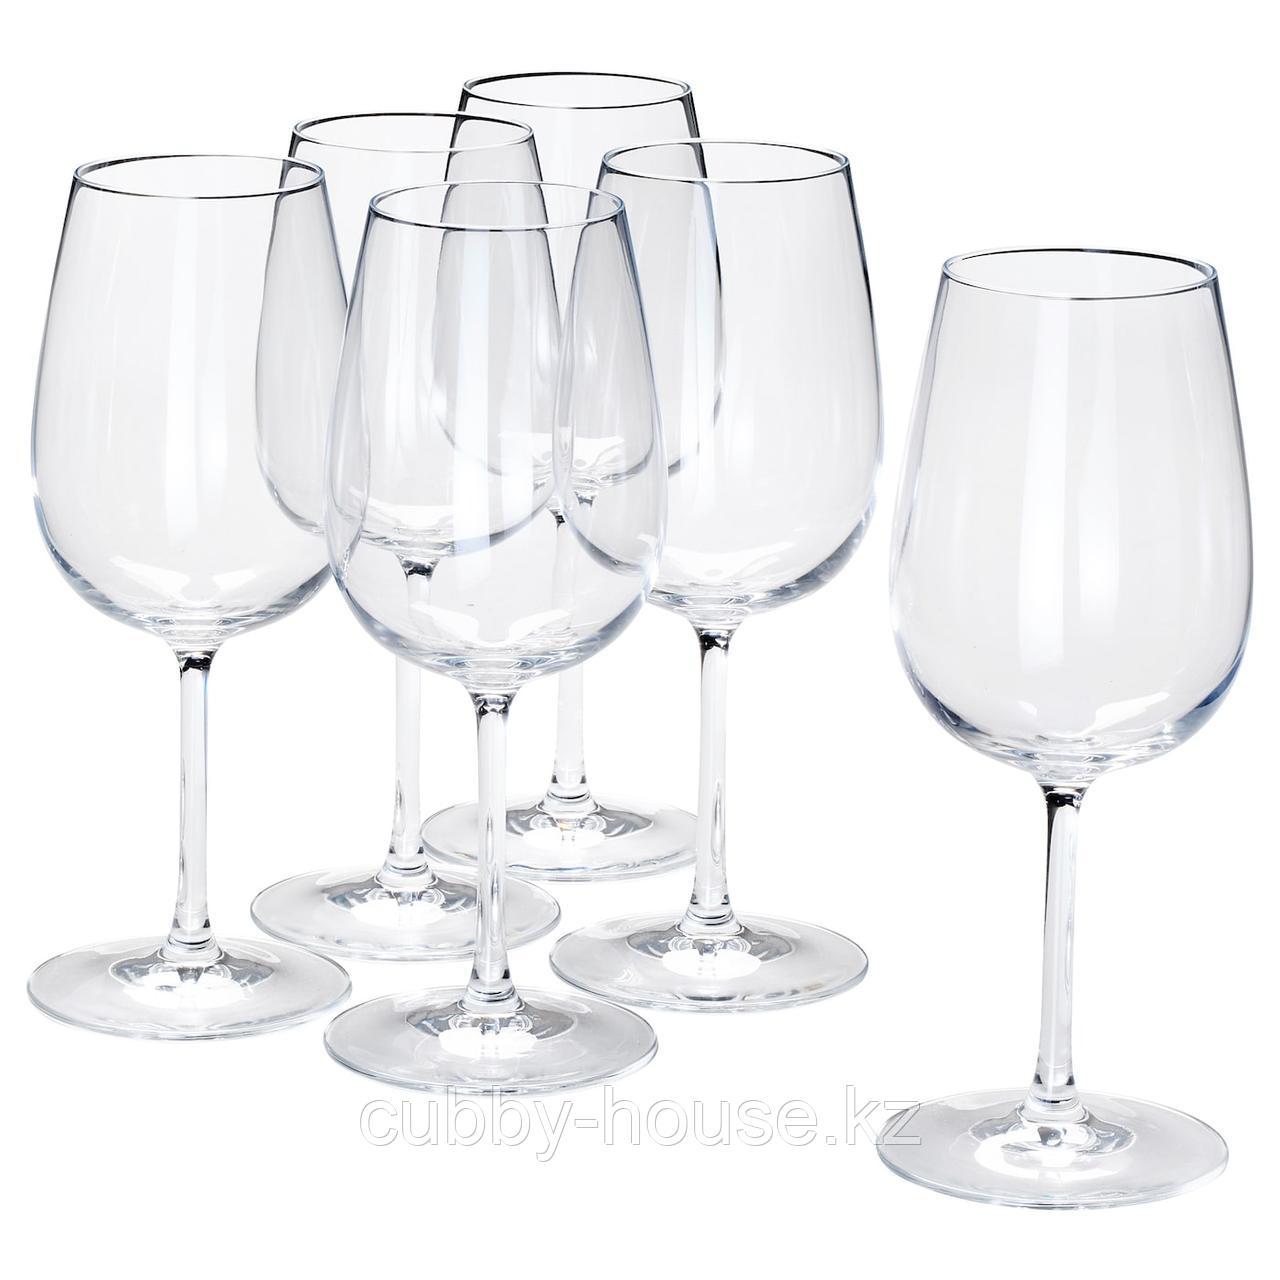 СТОРСИНТ Бокал для вина, прозрачное стекло, 49 сл